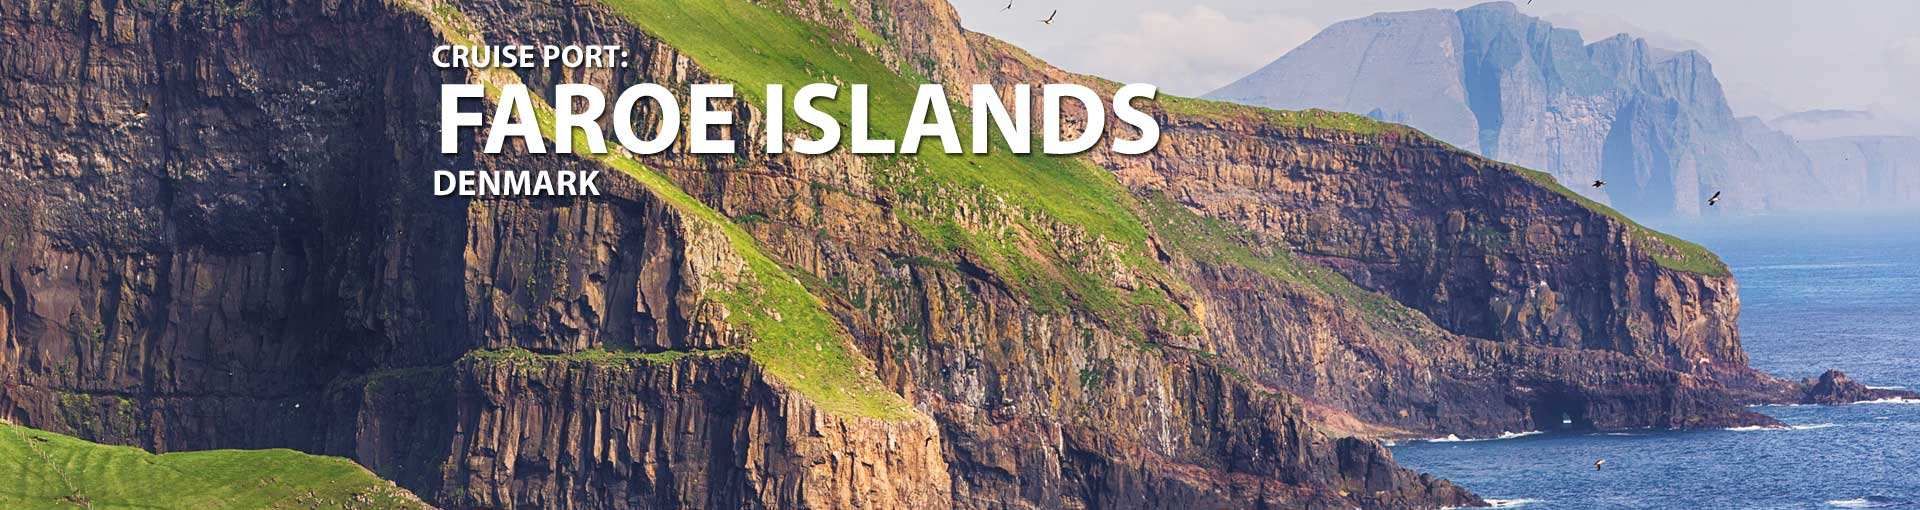 Cruises to Faroe Islands, Denmark